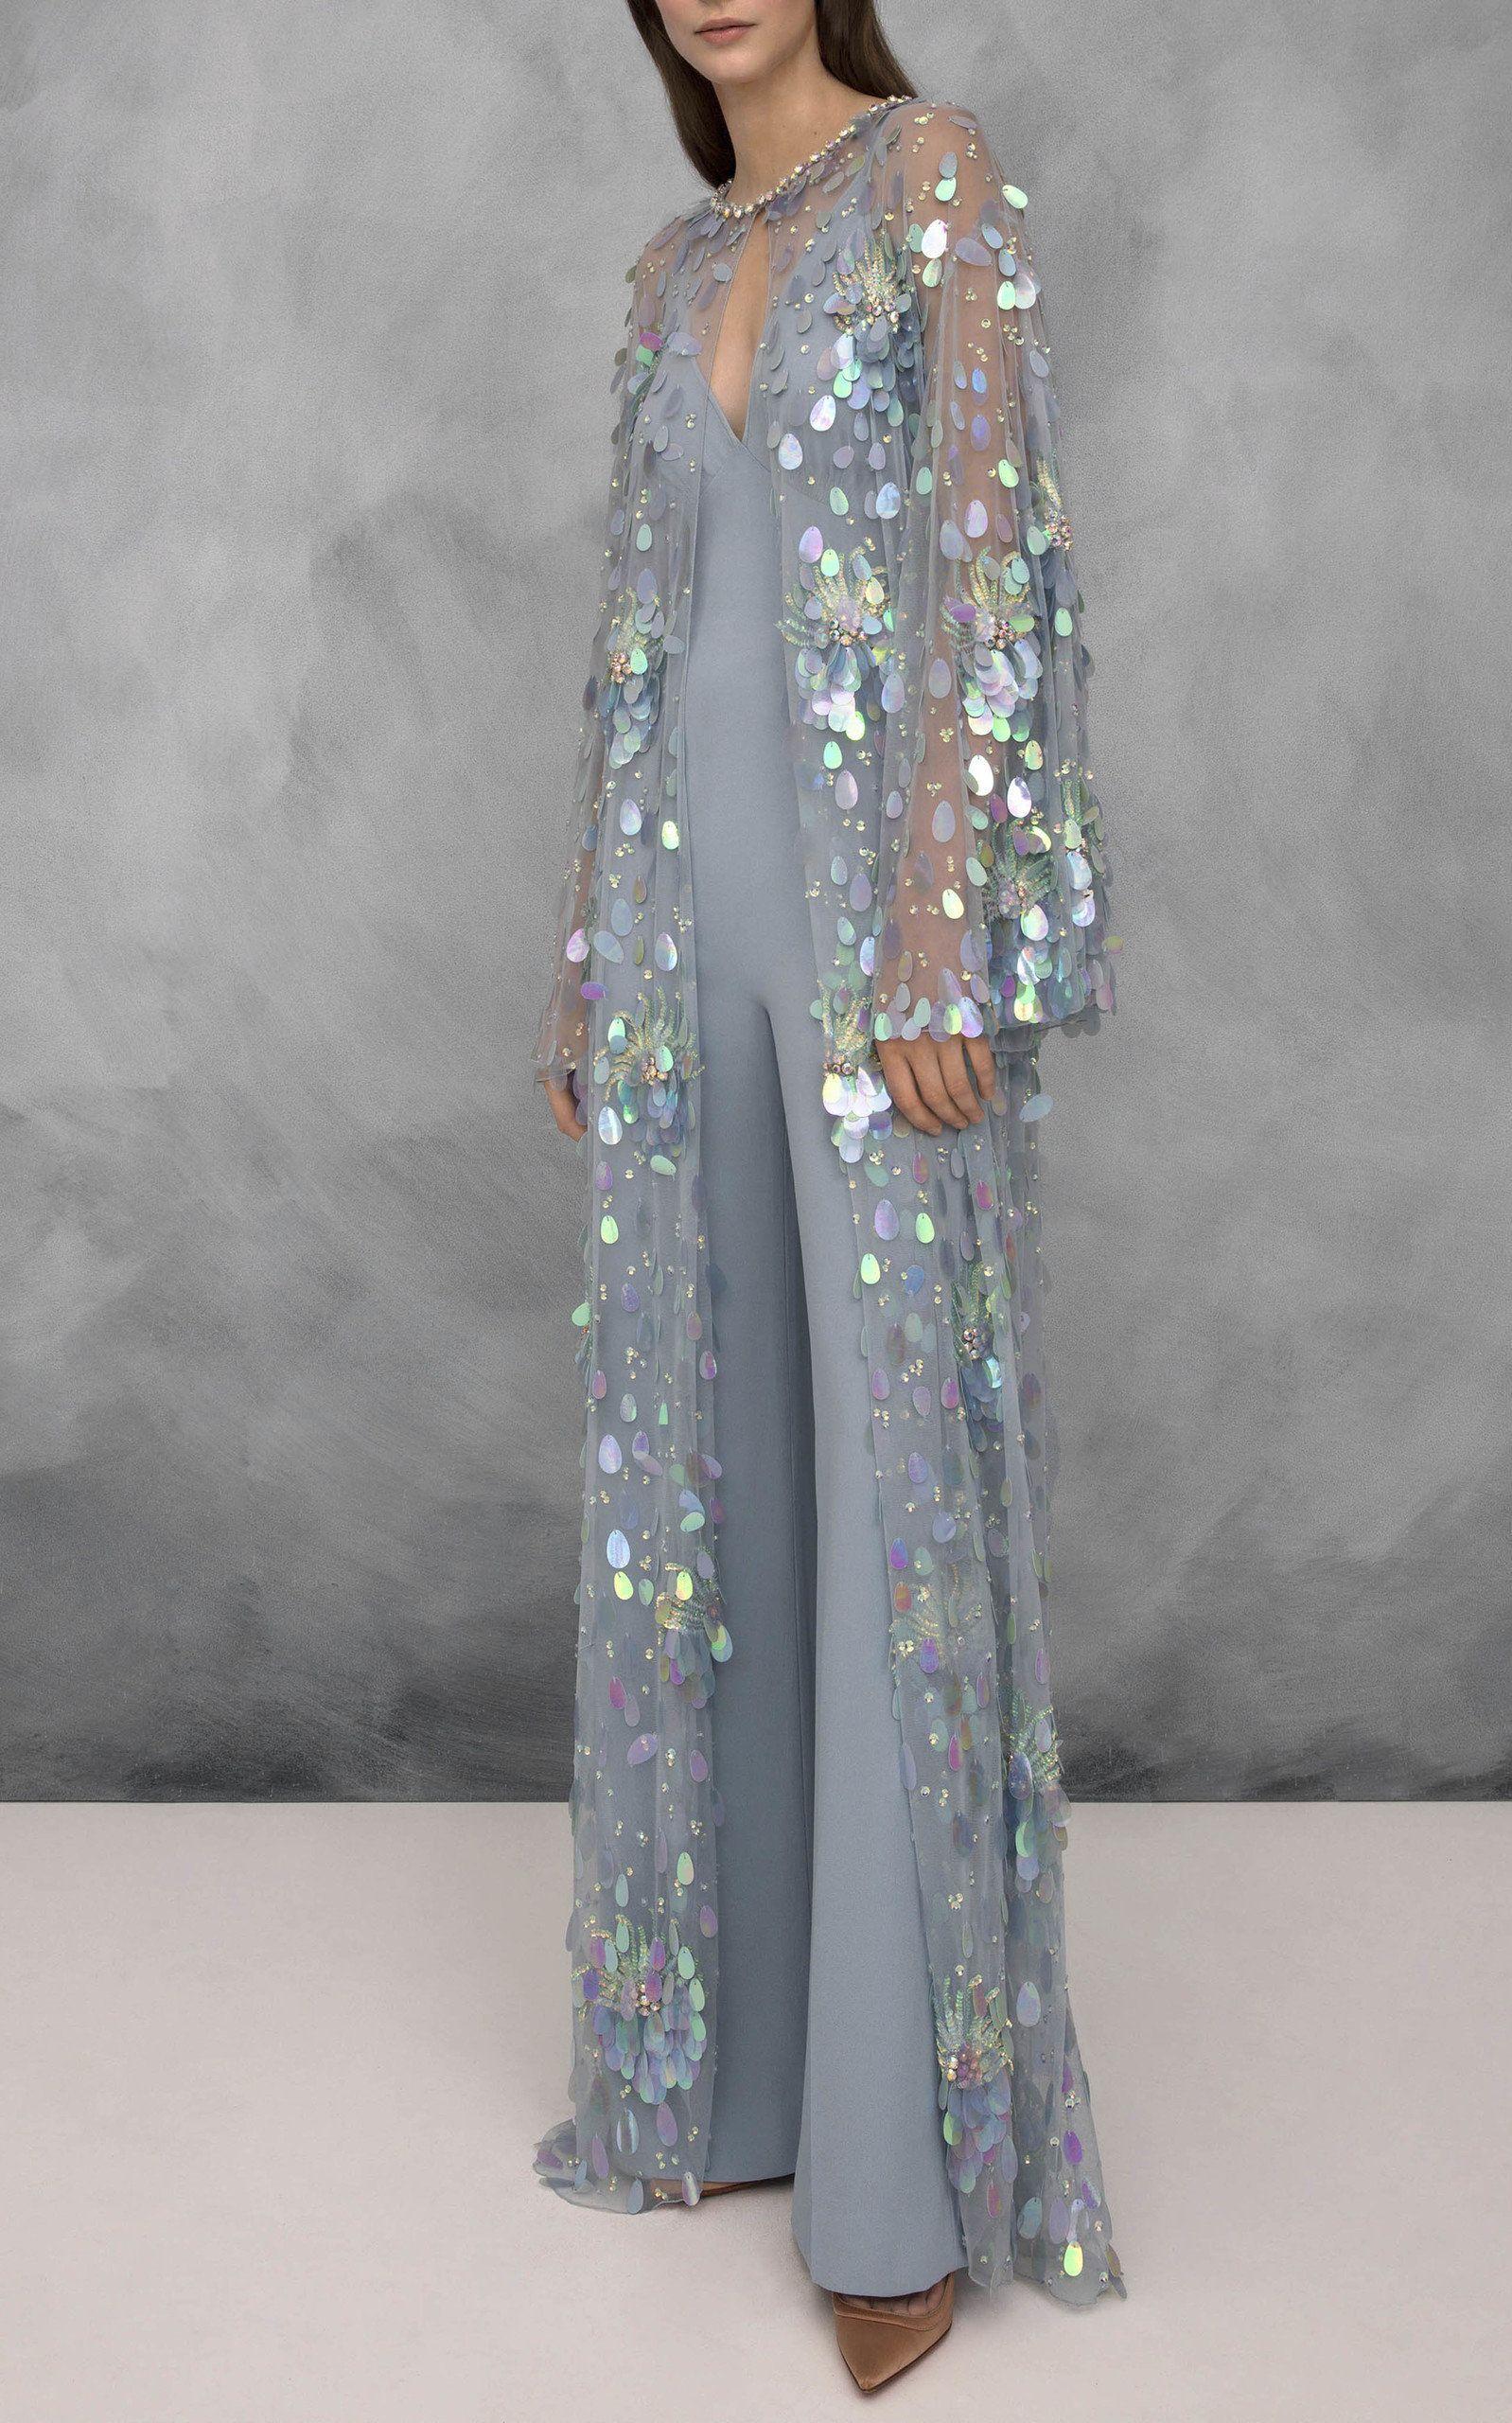 572aa5390f2 Almandine Sequin Coat by JENNY PACKHAM for Preorder on Moda Operandi